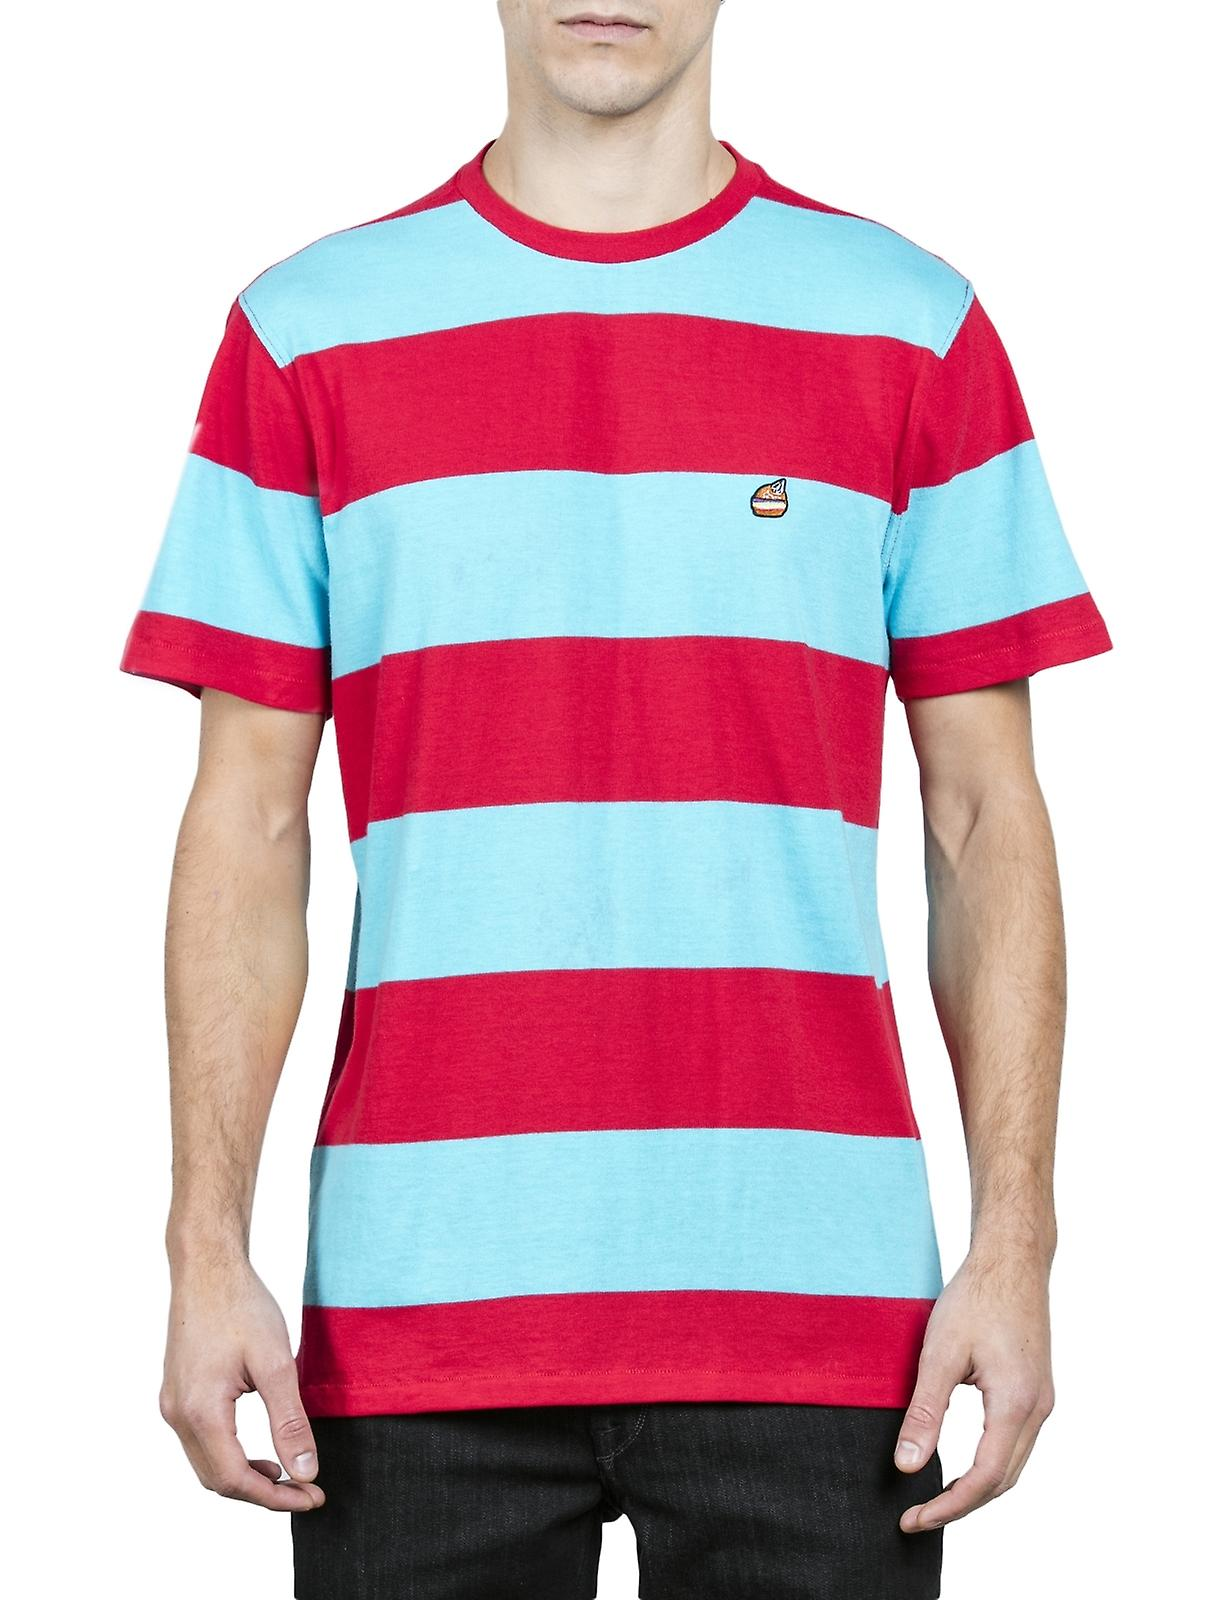 Volcom Burger X Vlcm Short Sleeve T-Shirt